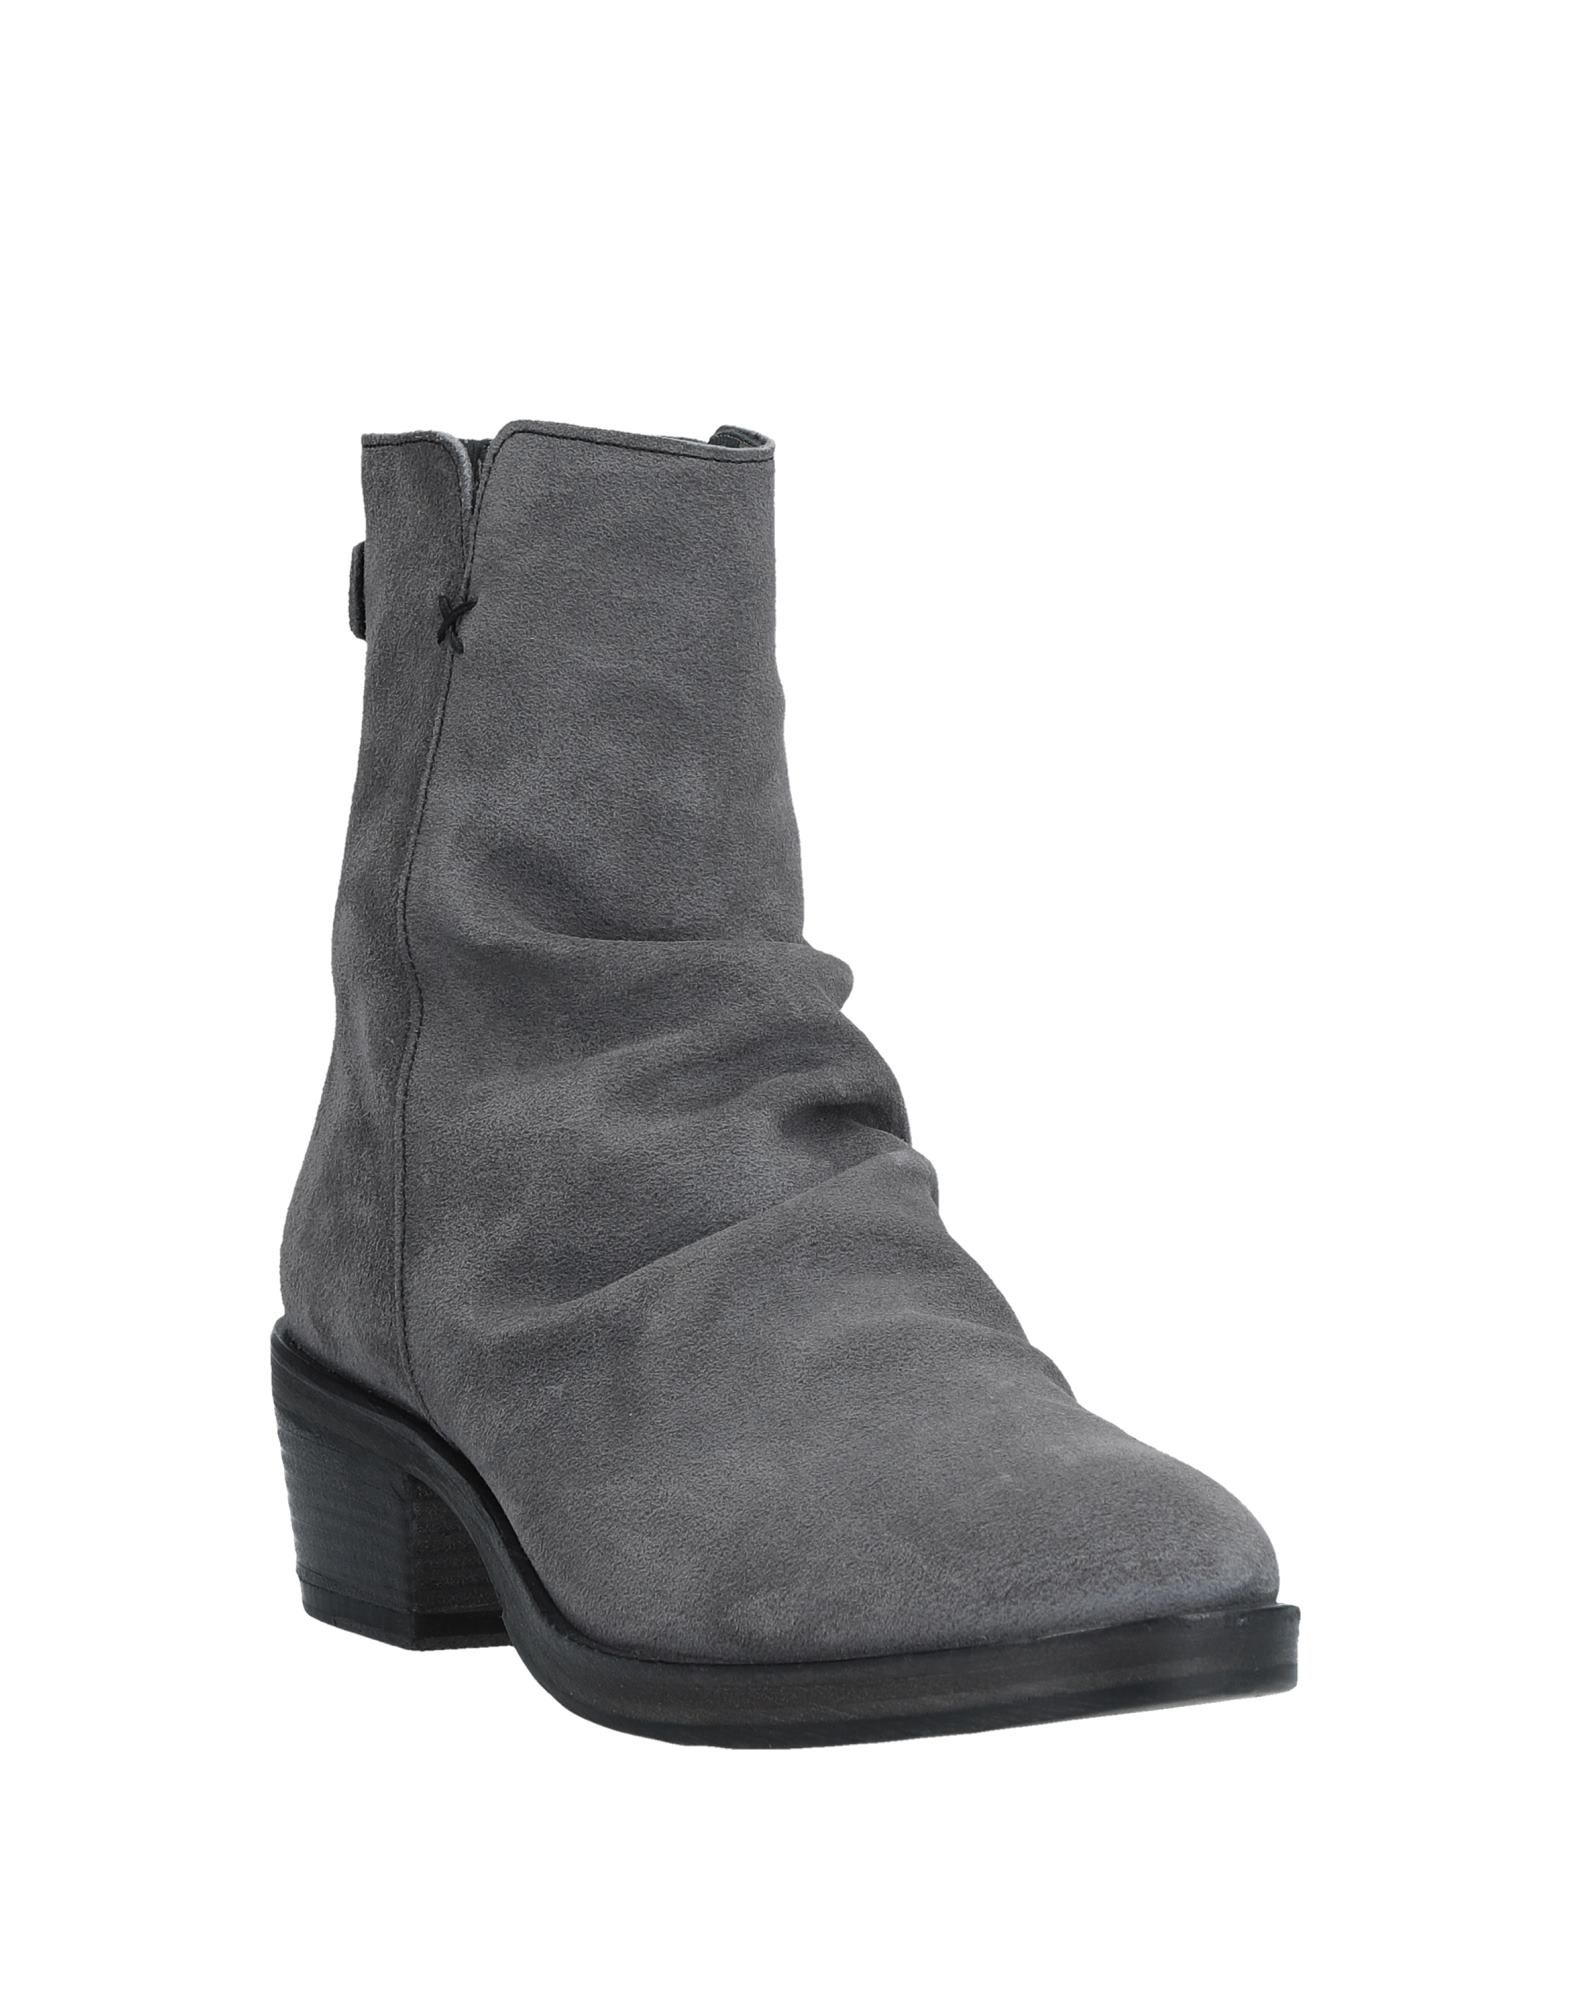 Rabatt Schuhe Fiorentini+Baker Stiefelette Stiefelette Fiorentini+Baker Damen  11537355GO 6b2ff8